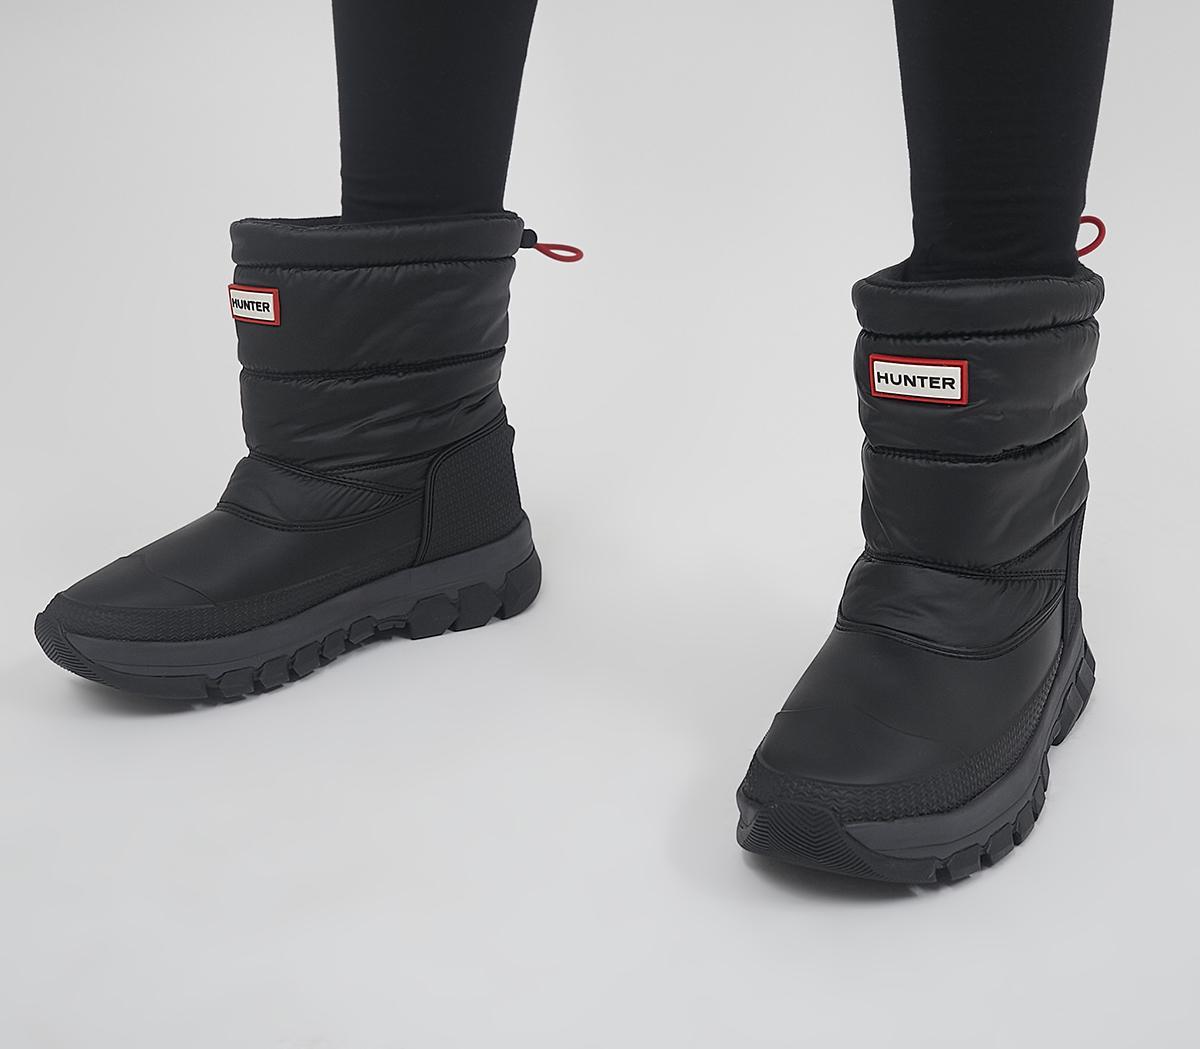 Hunter Original Insulated Snow Boots